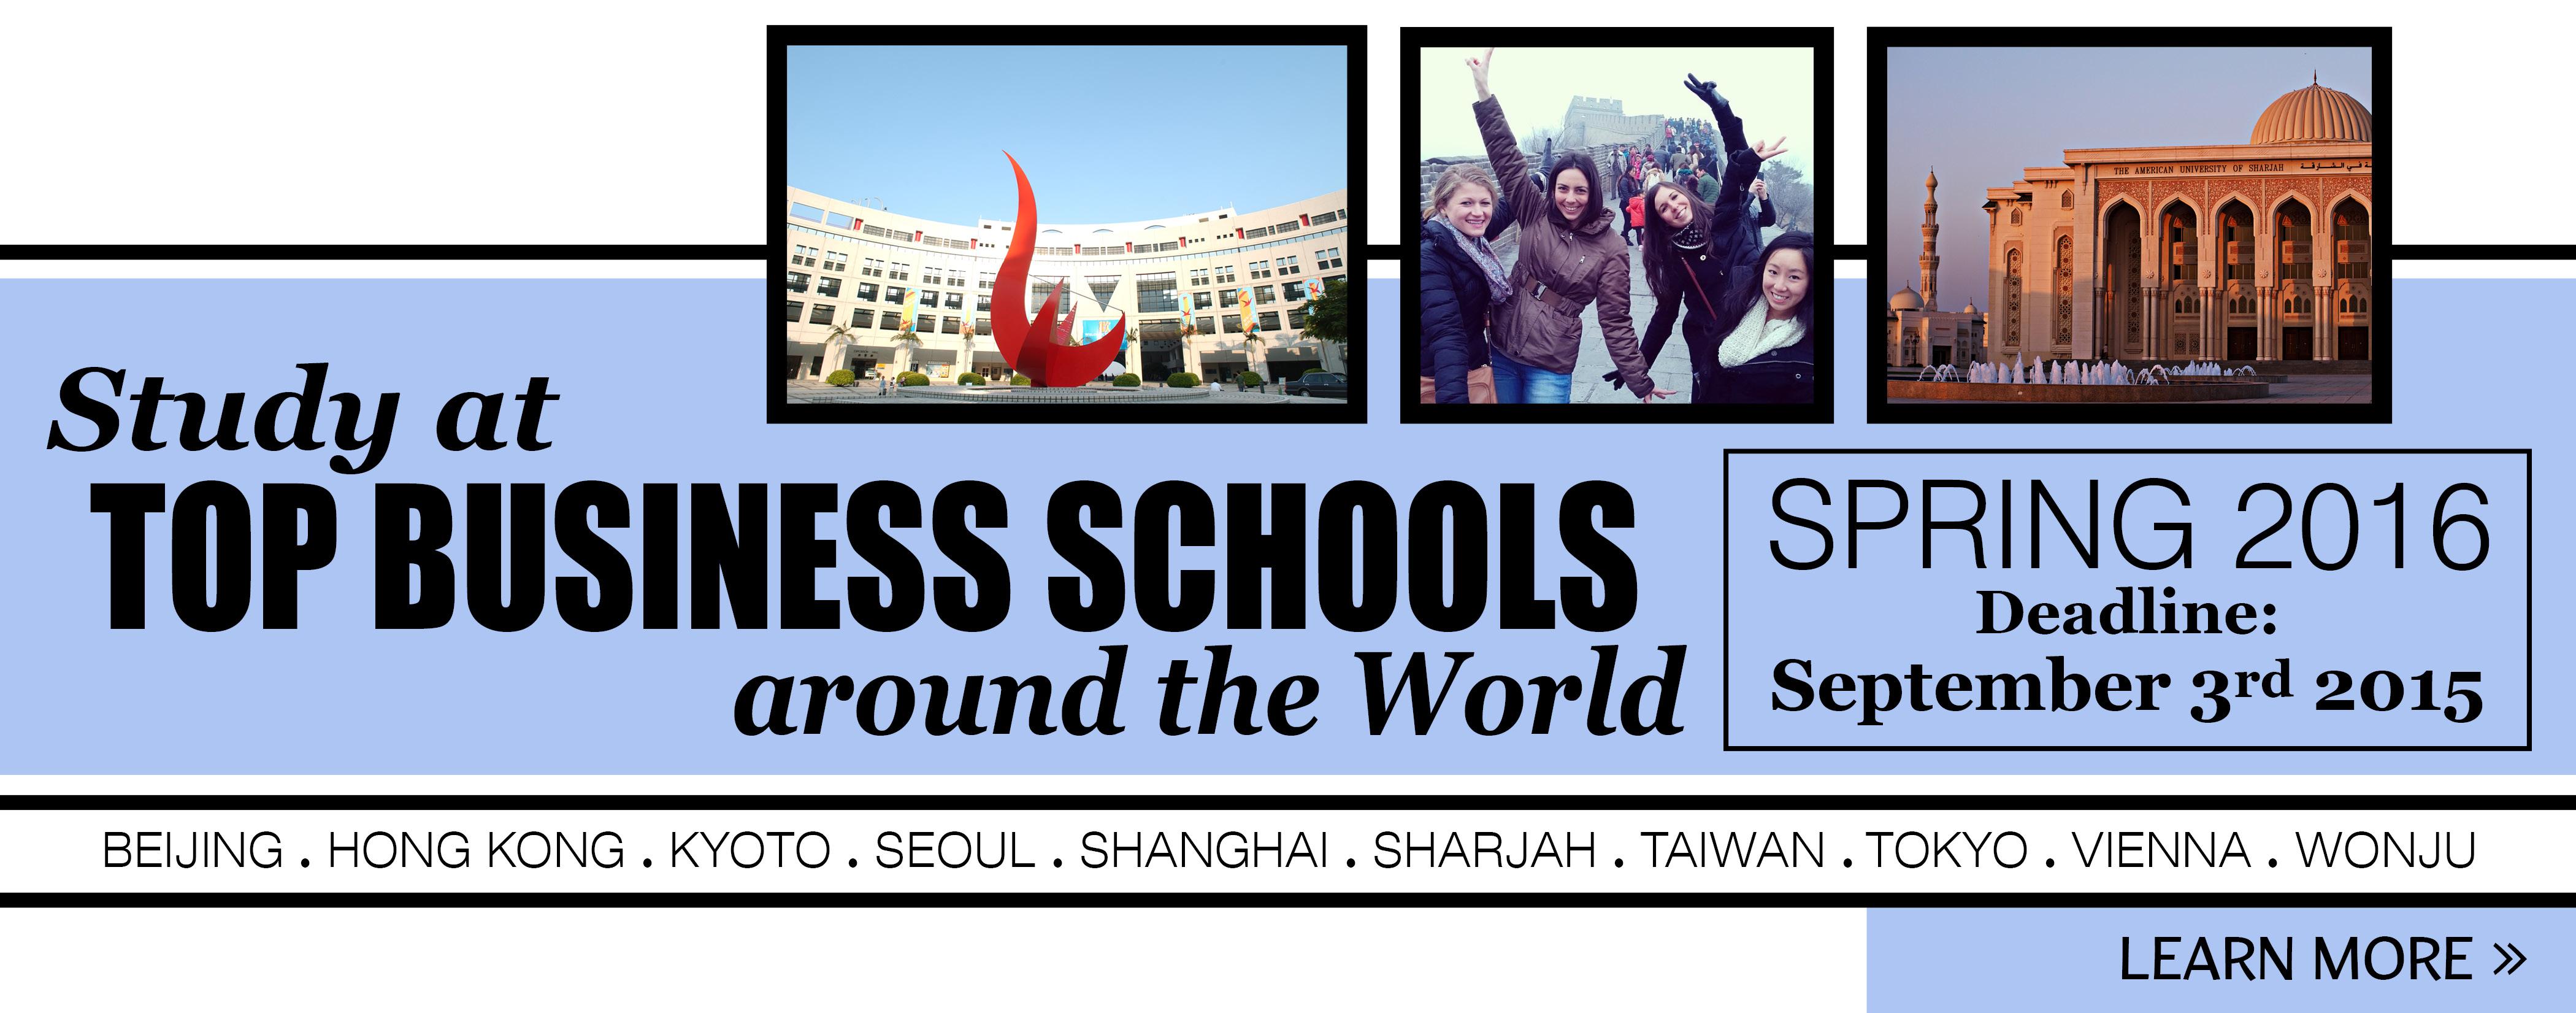 Study at Top Business Schools around the world.  Sprig 2016  Deadline:  September 3rd 2015.  Beijing, Hong Kong, Kyoto, Seoul, Shanghai, Sharjah, Taiwan, Tokyo, Vienna, Wonju